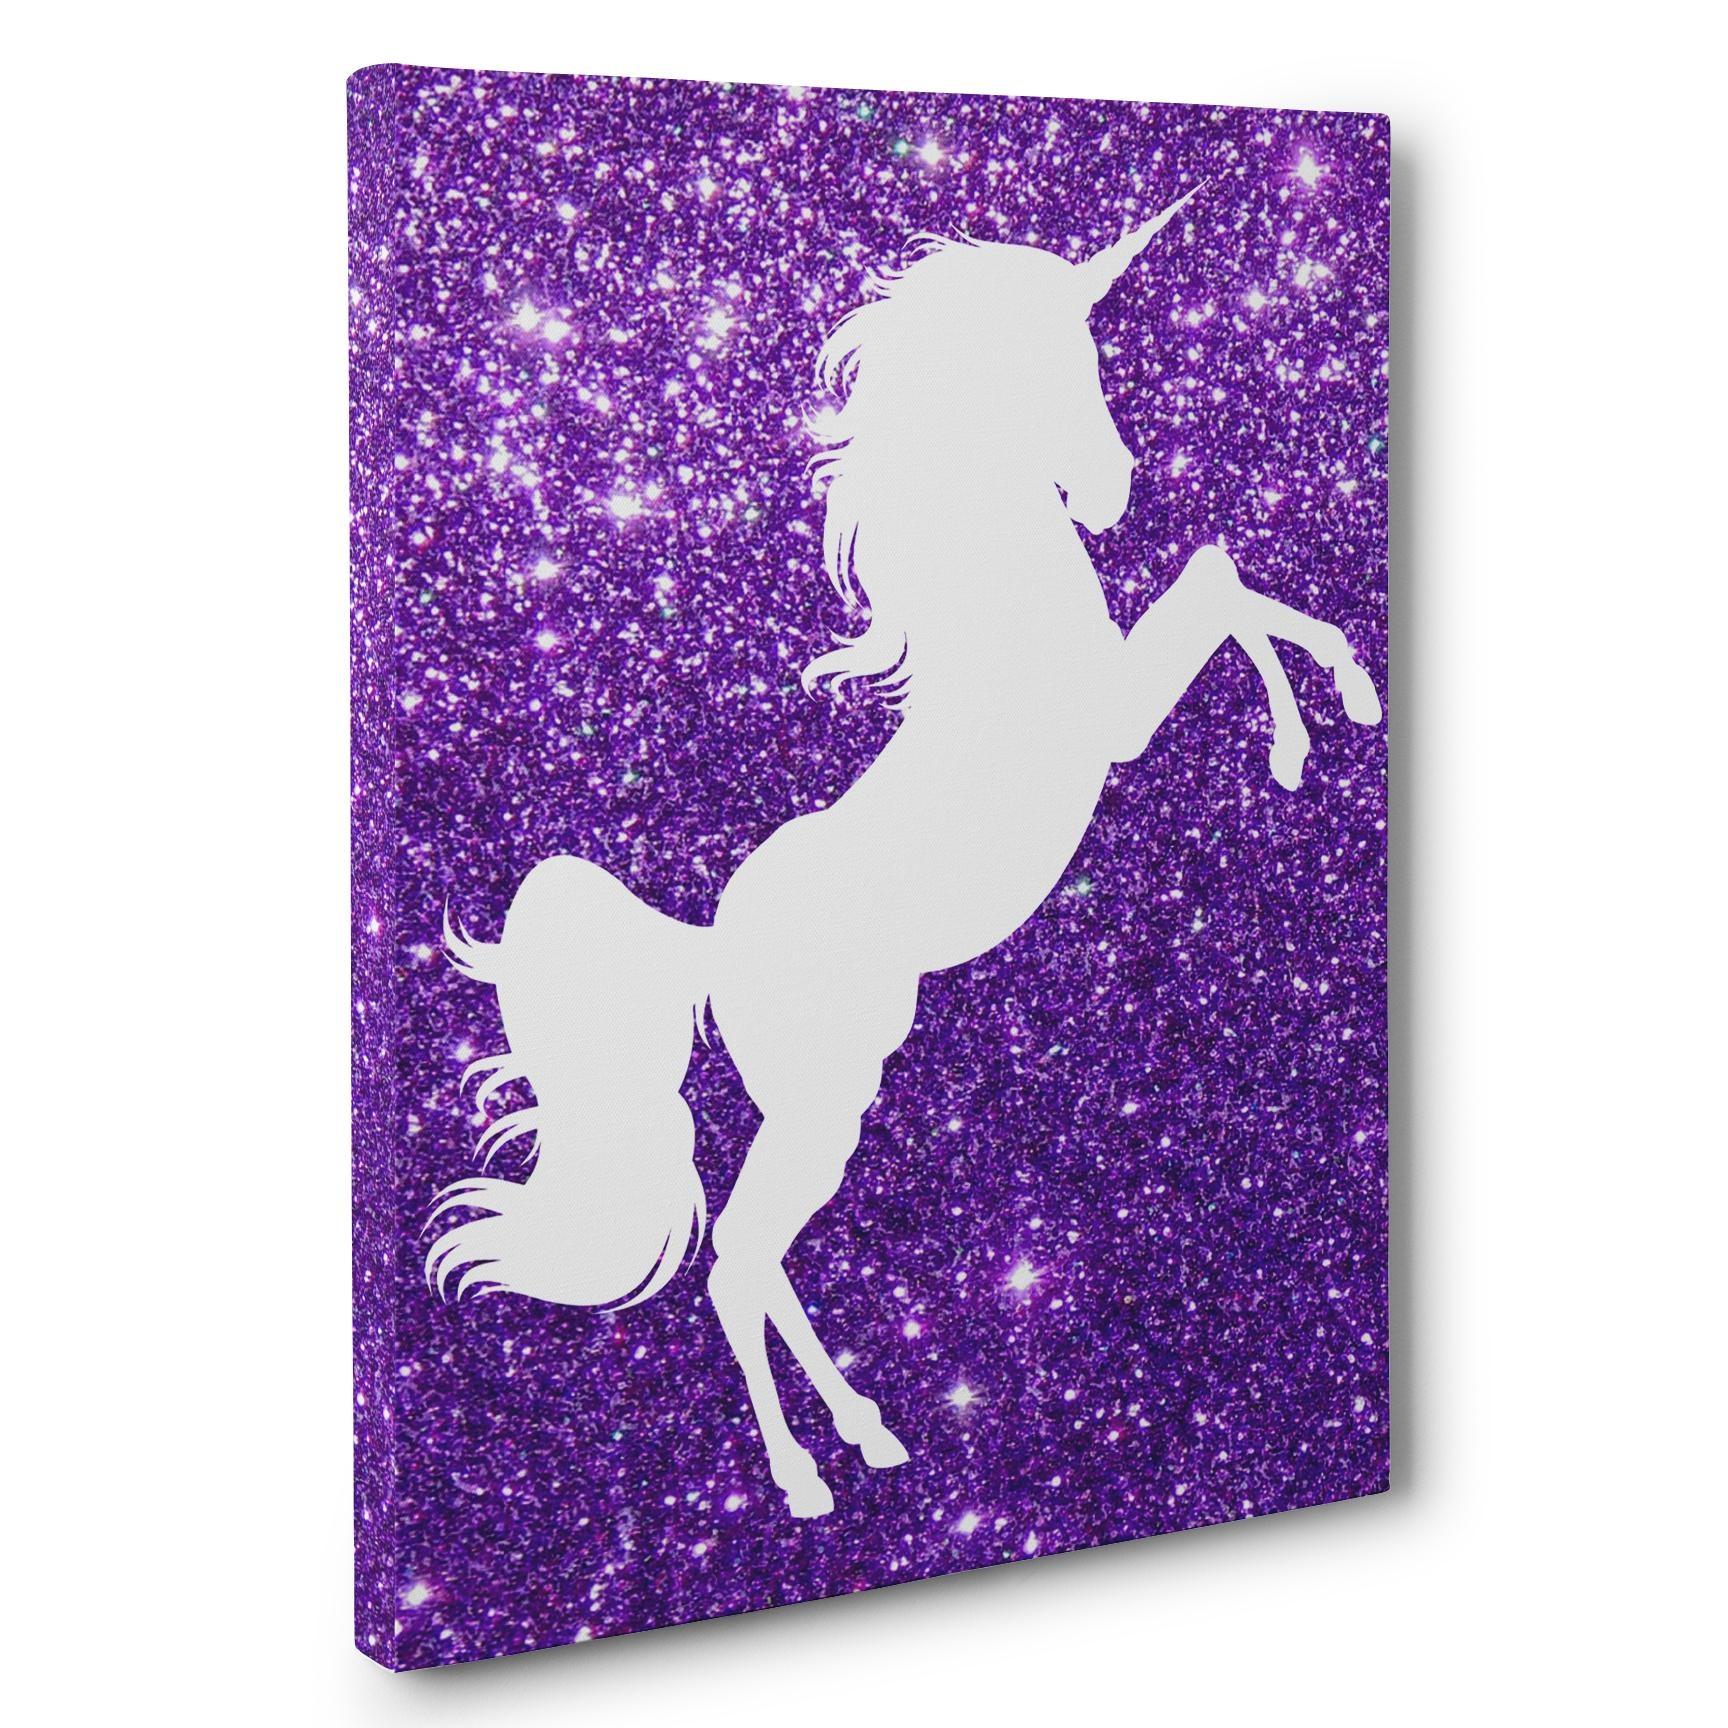 Unicorn Purple Nursery Decor Canvas Wall Art – Paper Blast Within Purple Canvas Wall Art (View 18 of 20)